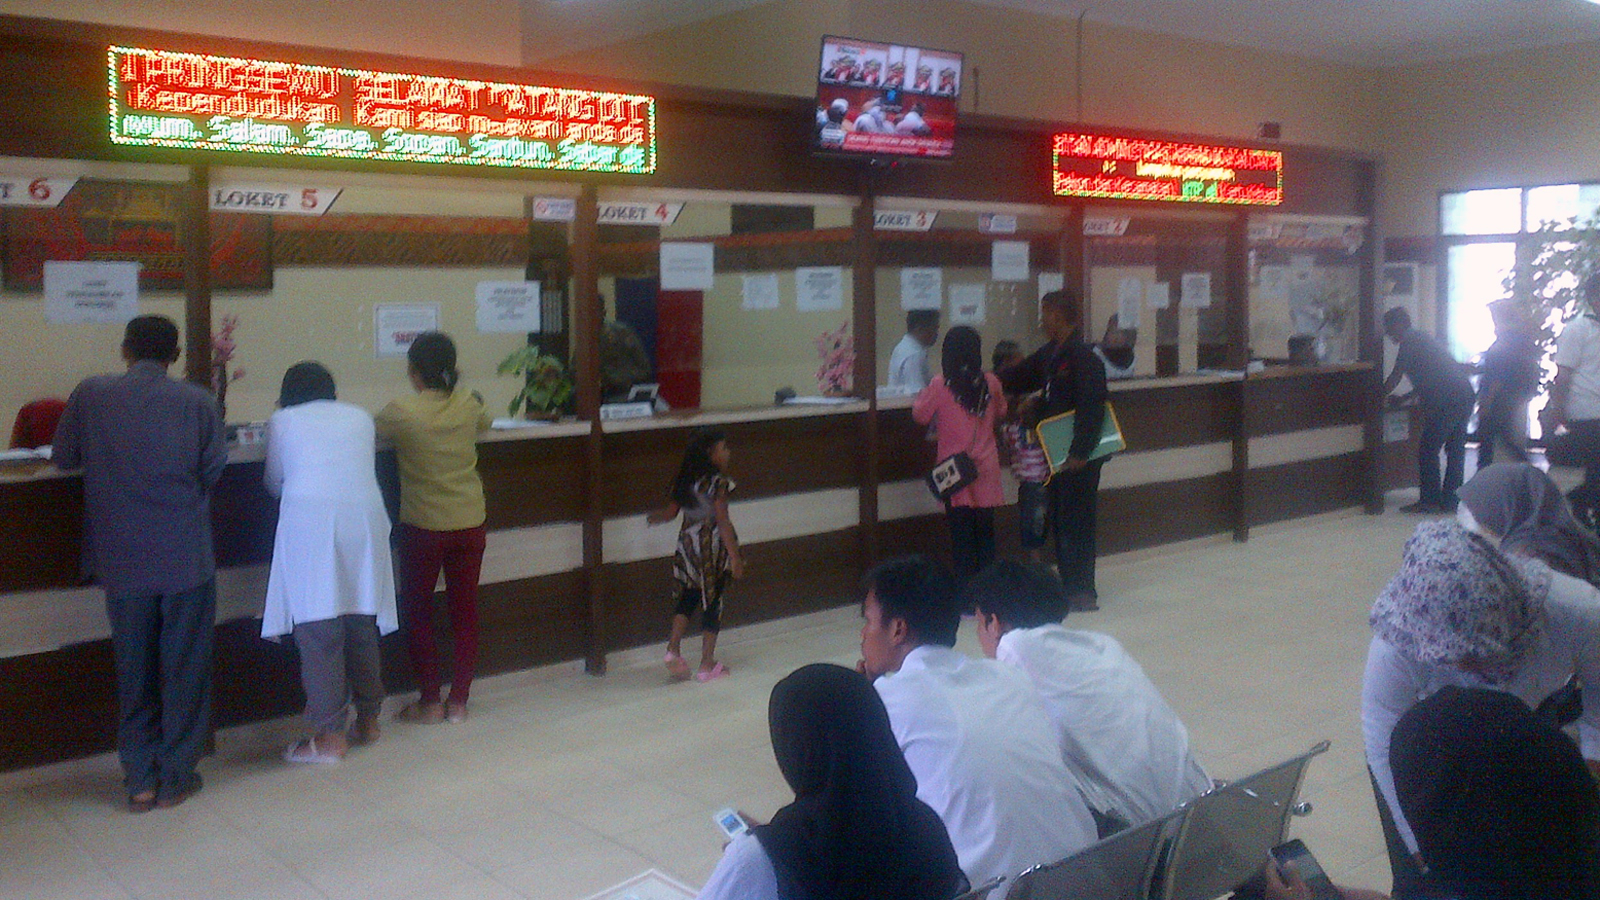 Ruang pelayanan Kantor Disdukcapil Pringsewu. (Lampungnews/Anton Nugroz)